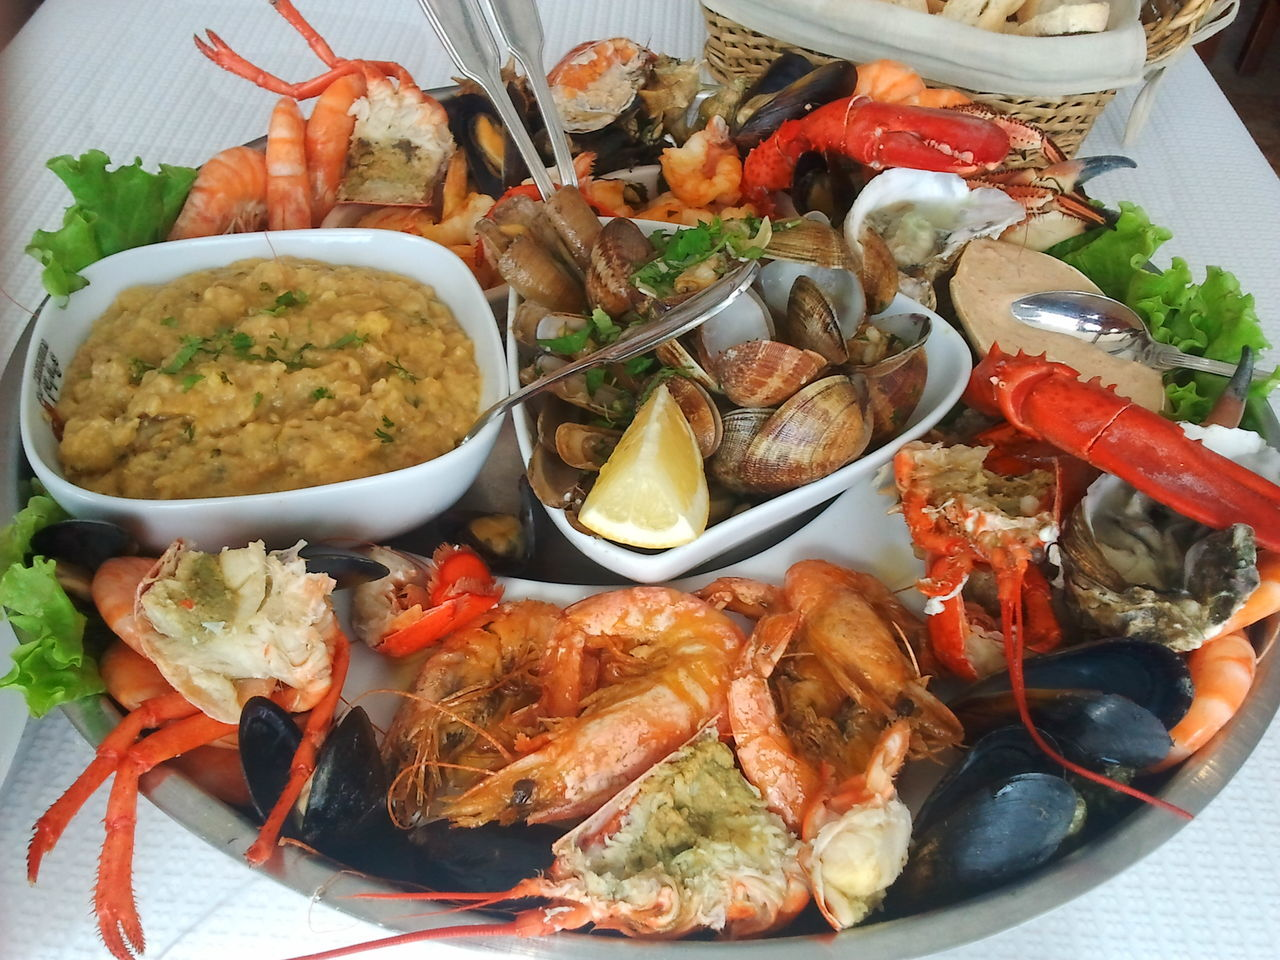 Foodporn Food Food Porn Foodphotography Seafoods Seafoodporn Marisco Marisqueira Crab Mariscada Foodgasm Portuguesefood Abundance Food And Drink Readytoeat Eating Eating Lunch